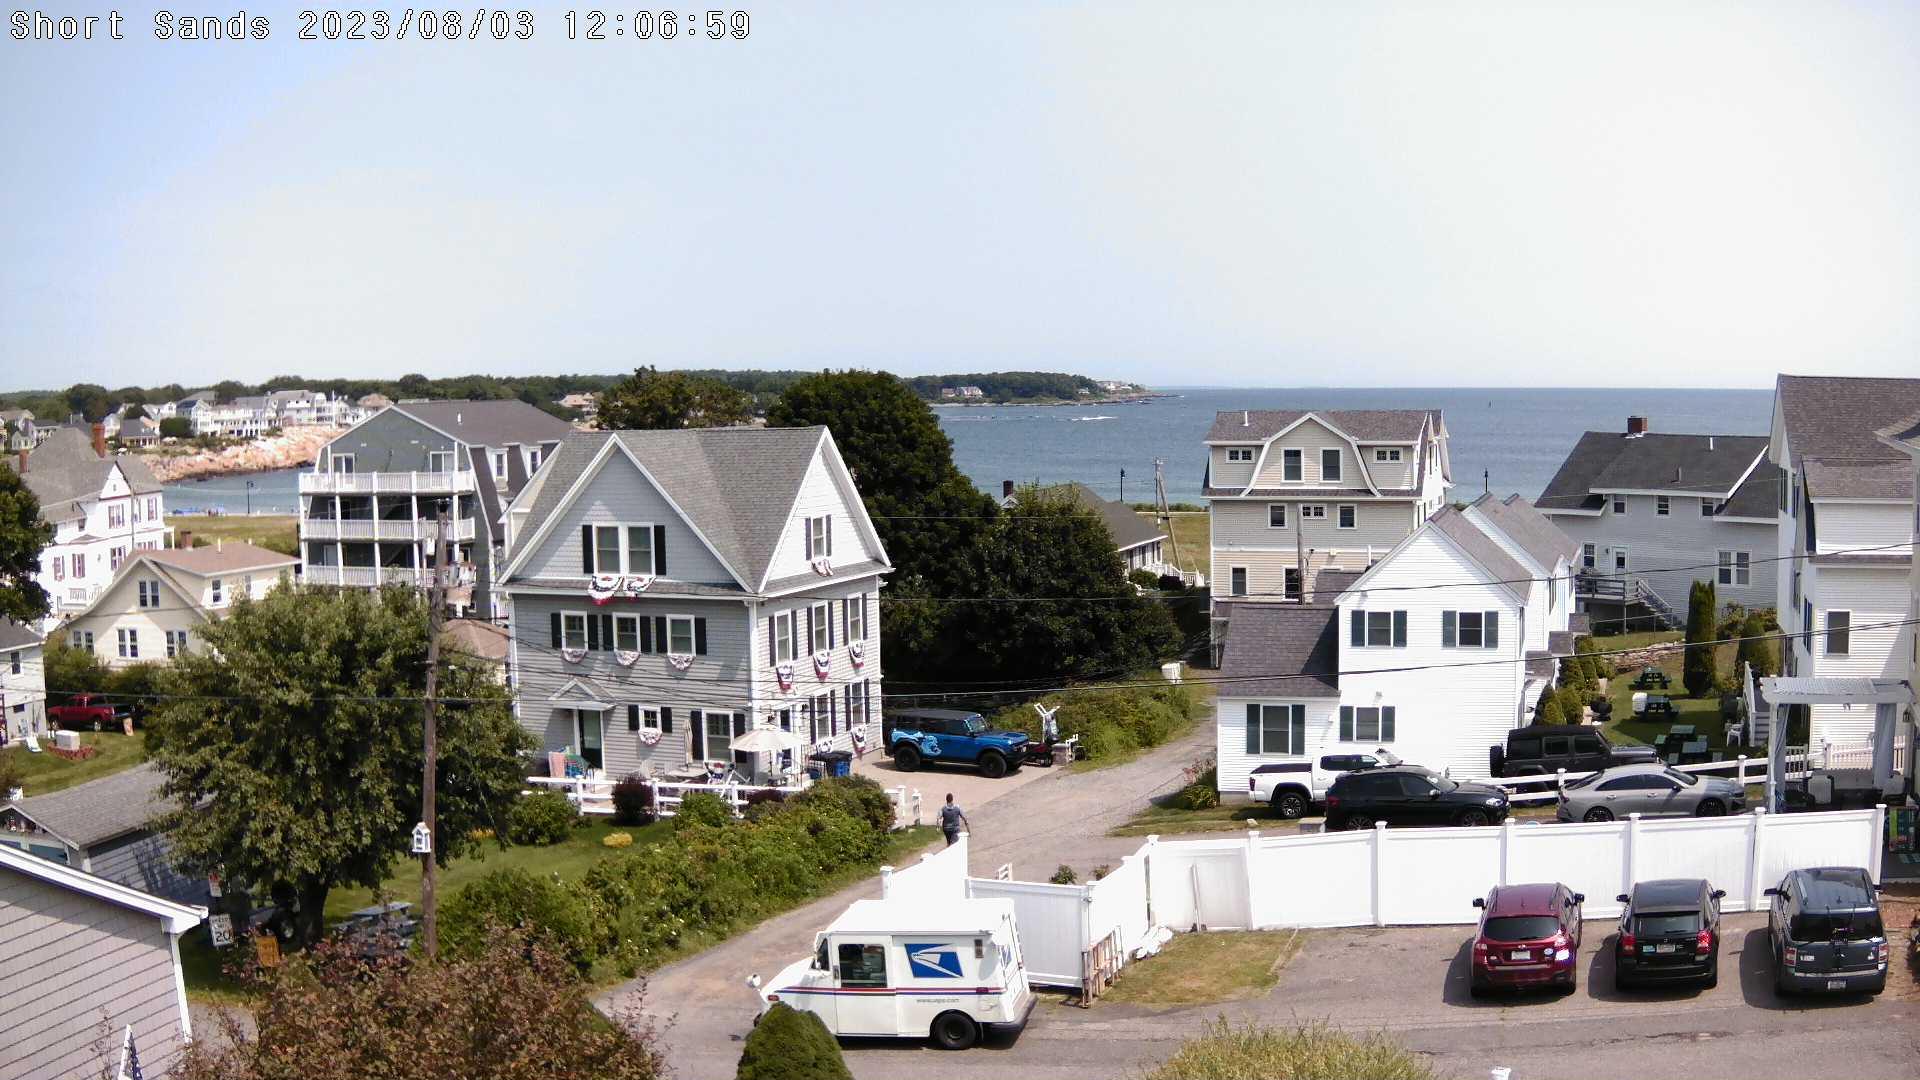 York Beach, Maine Ven. 12:07